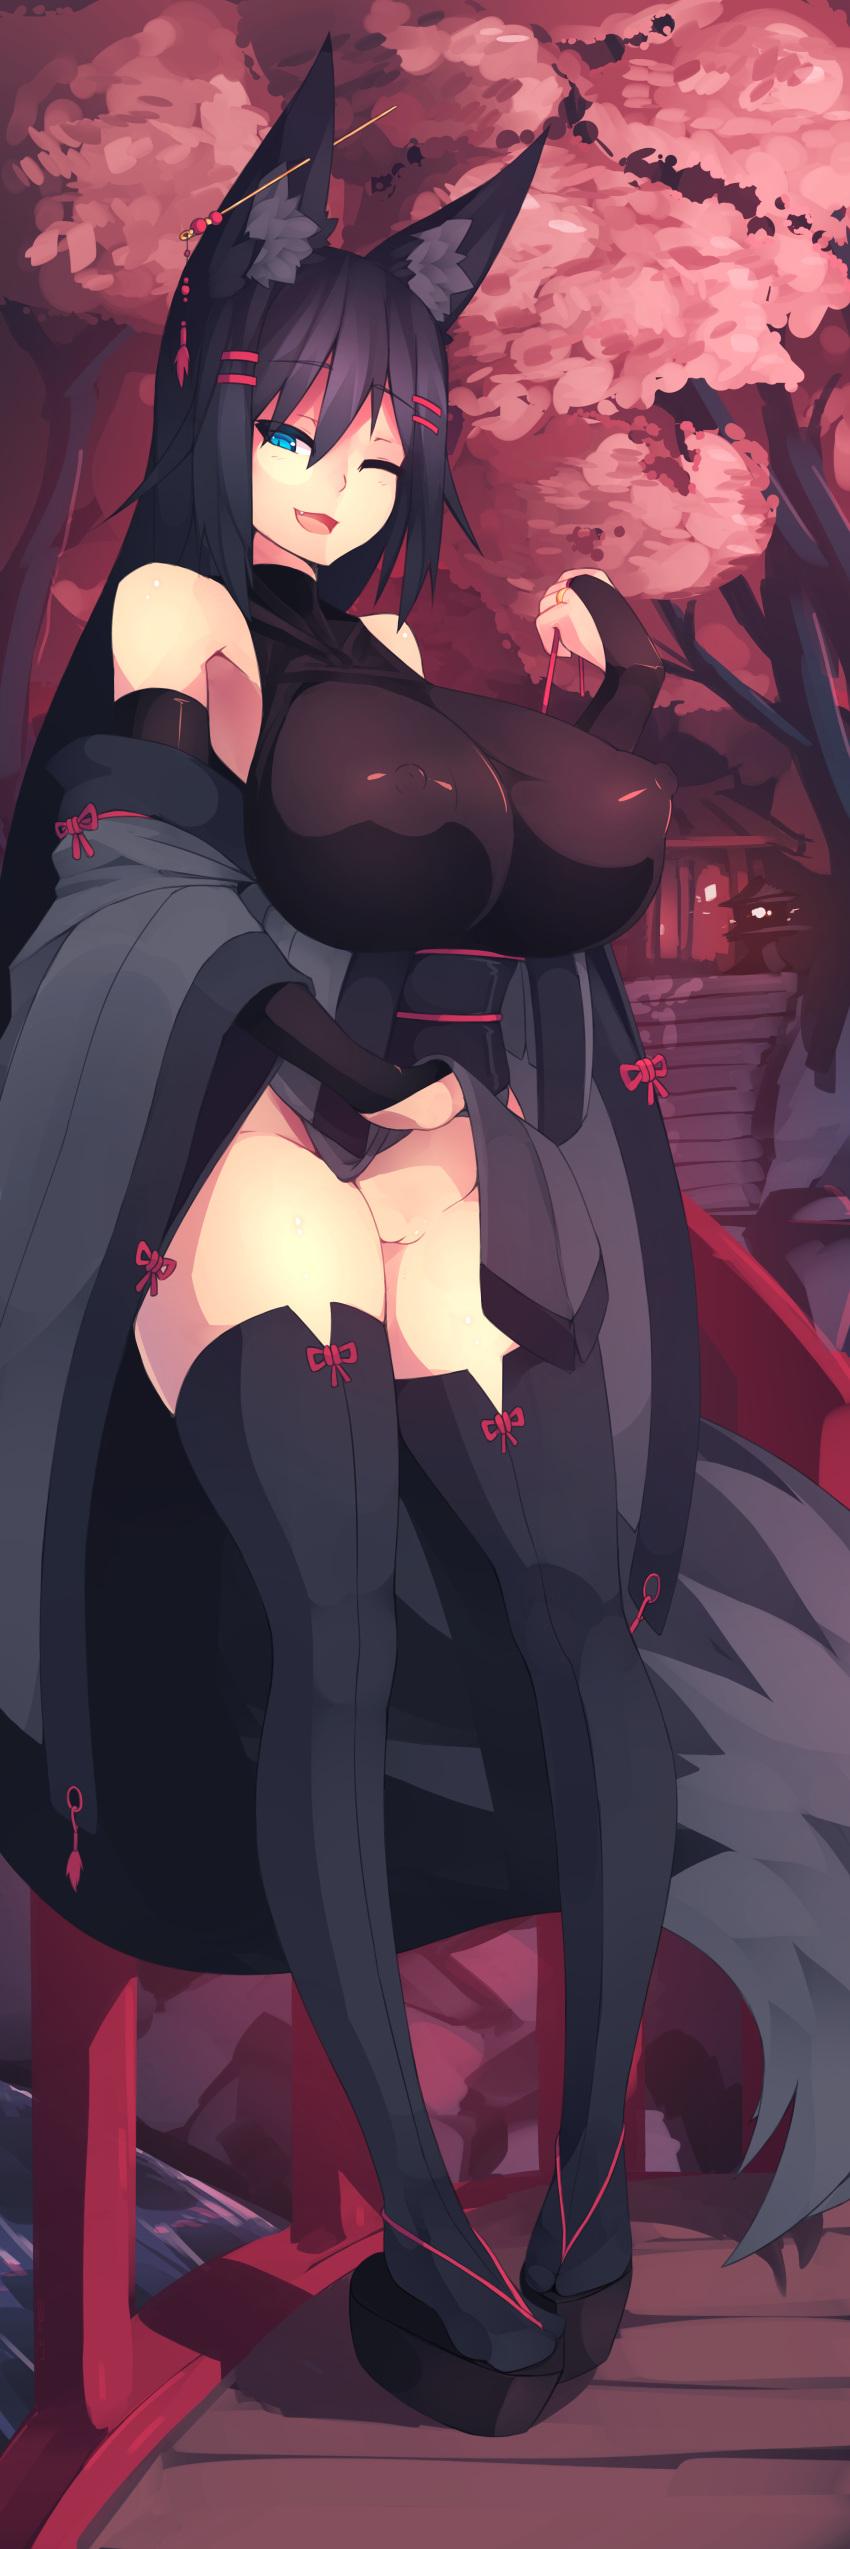 death end hentai re;quest Mr. b natural mst3k